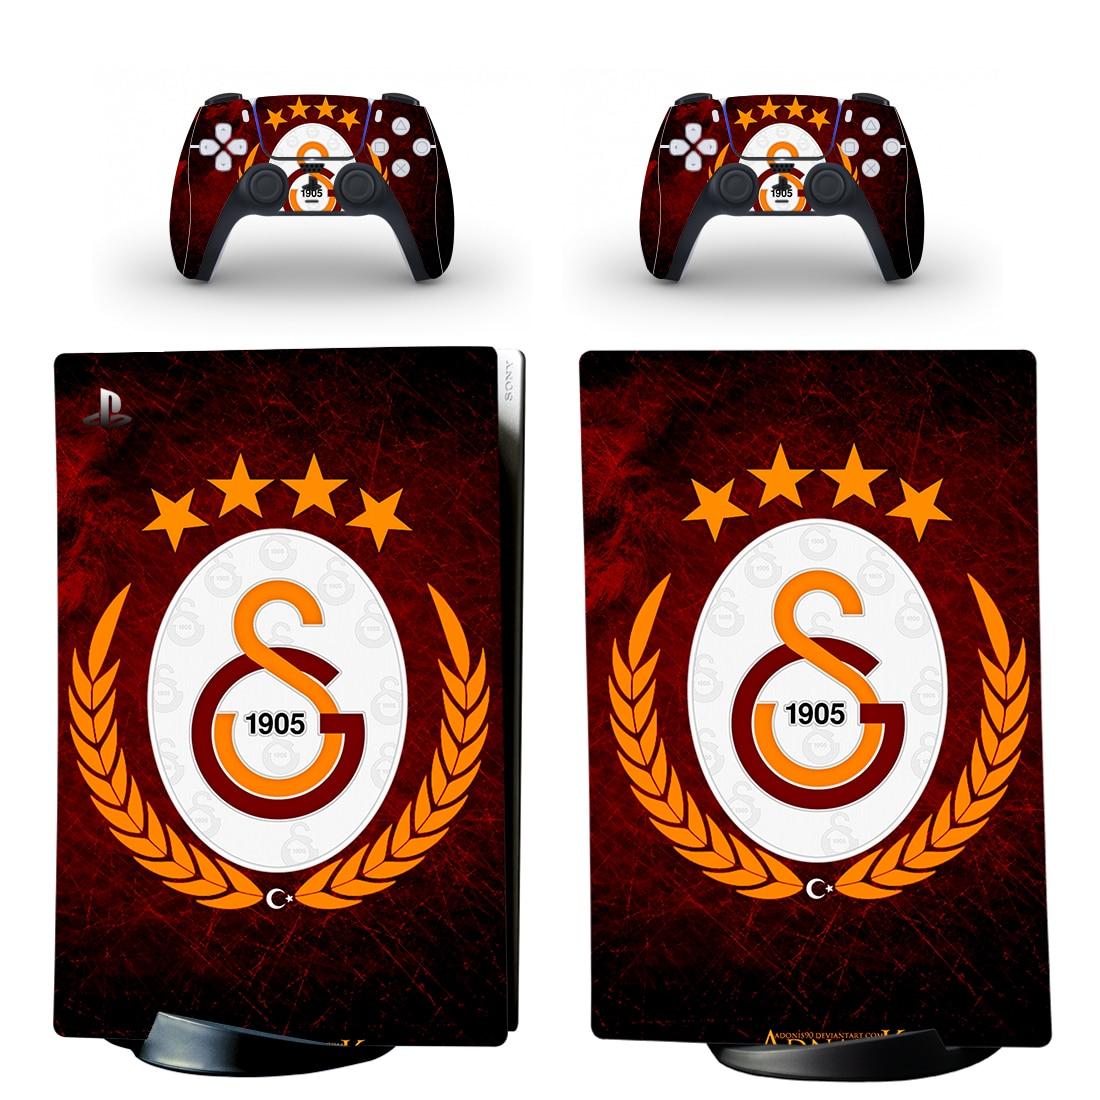 Galatasaray PS5 طبعة رقمية لواصق الجلد غطاء لوحدة التحكم بلاي ستيشن 5 ووحدات تحكم PS5 ملصق الفينيل